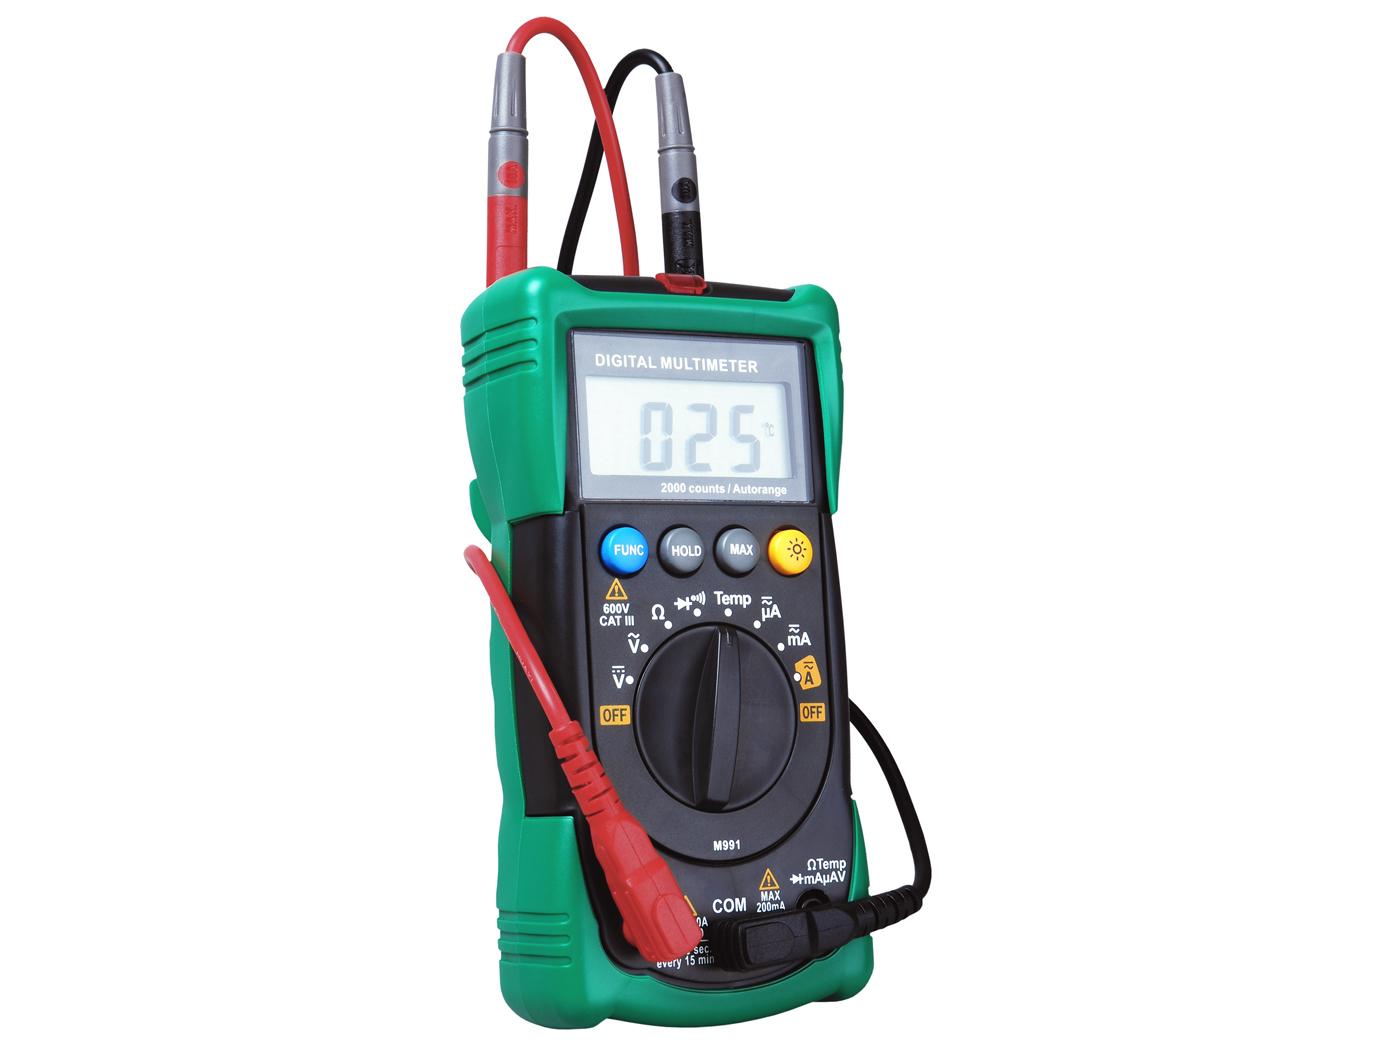 Multimeter Spannungsprufer Voltmeter Messgerat Ac Dc Spannung